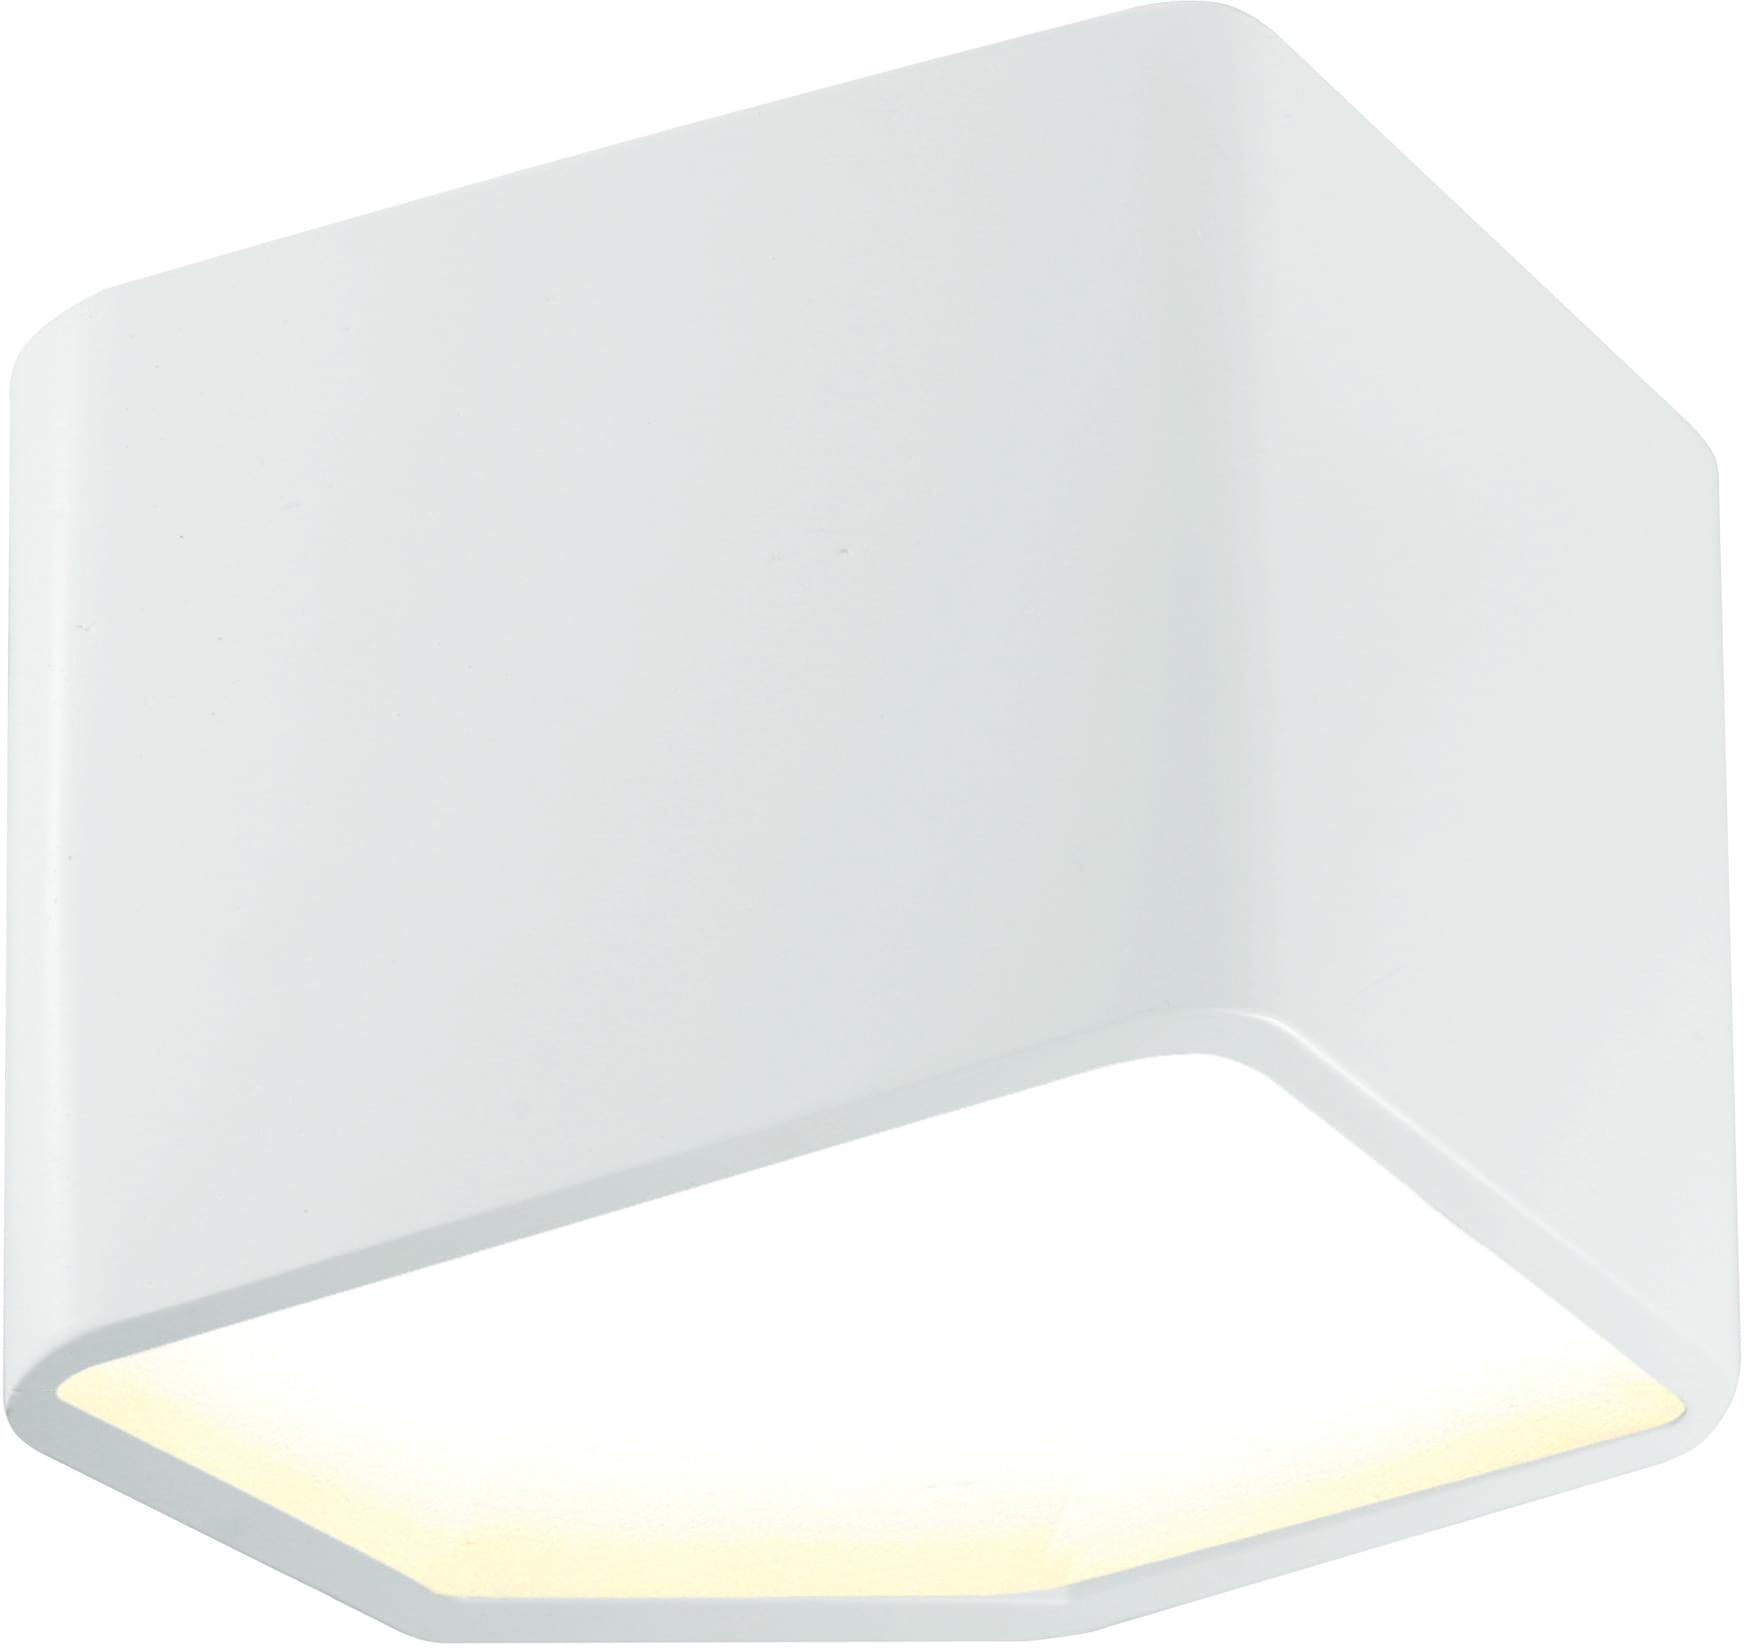 Modern White Wall Lamp Space LED 6W